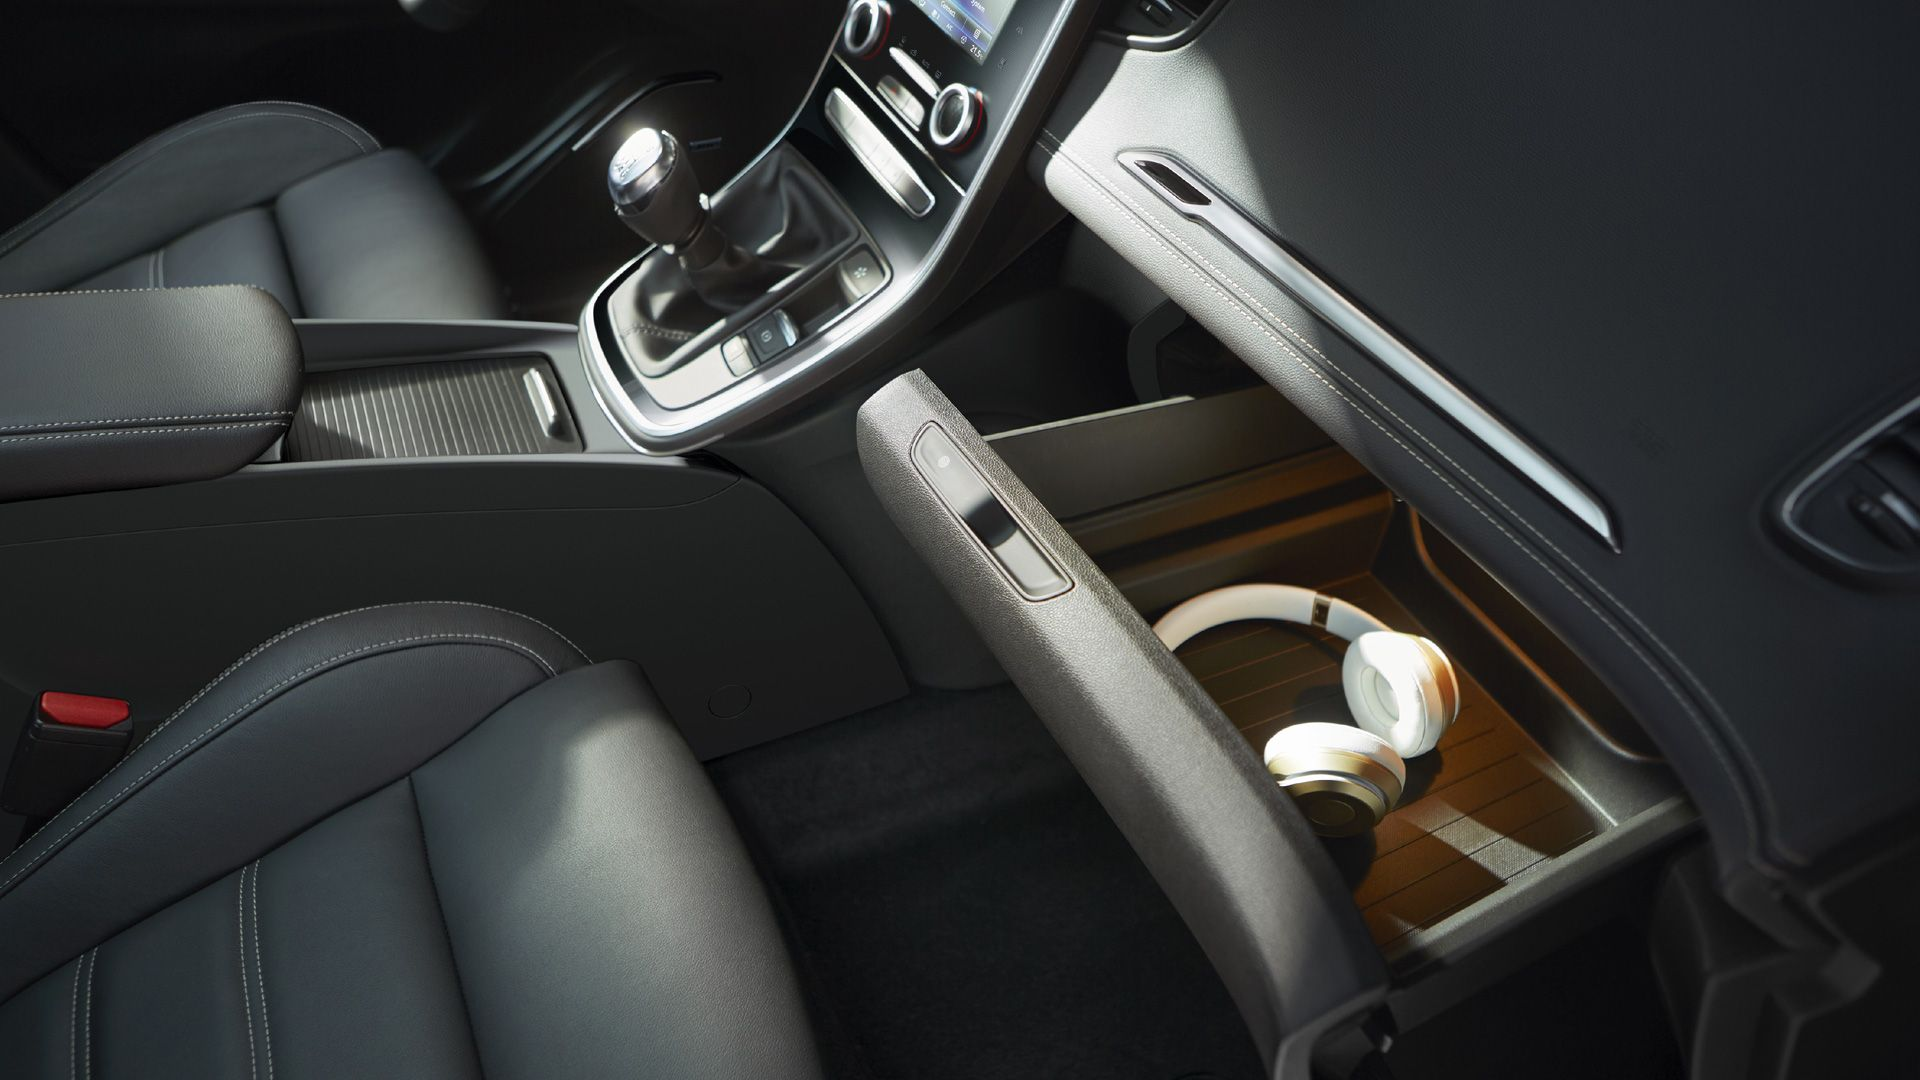 2016 Renault Grand Scenic Interior Inside No Major Surprises